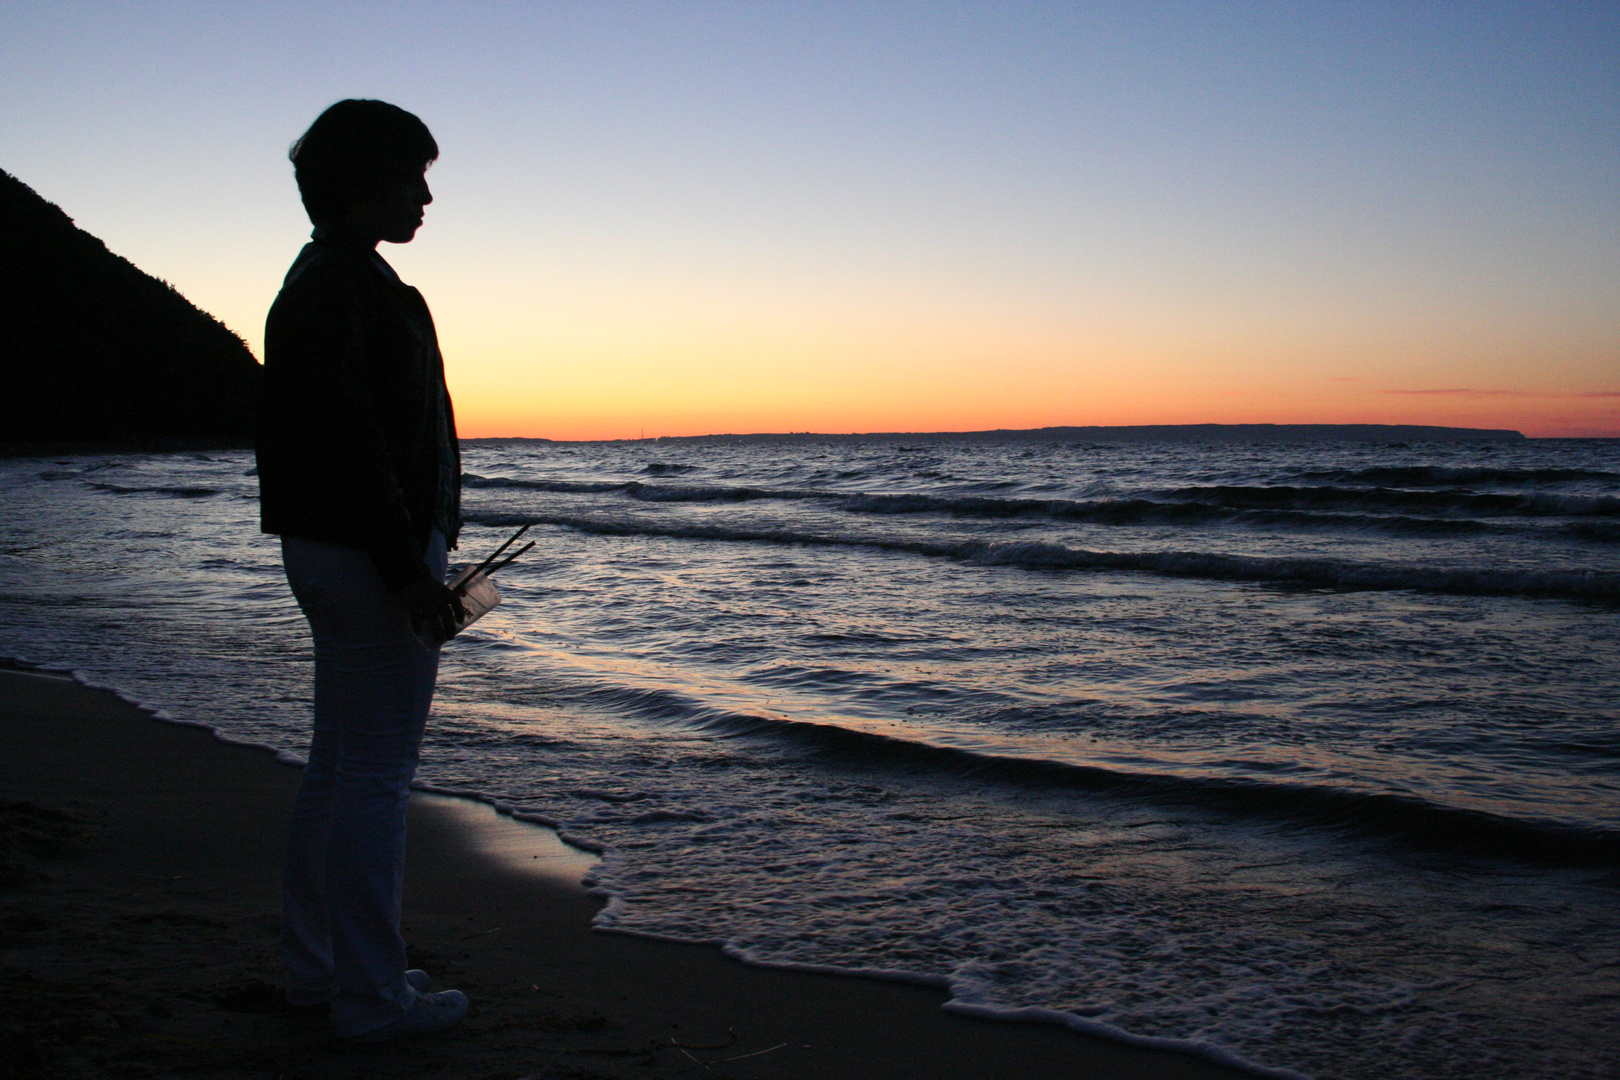 Abends am Strand, Insel Rügen, Sellin